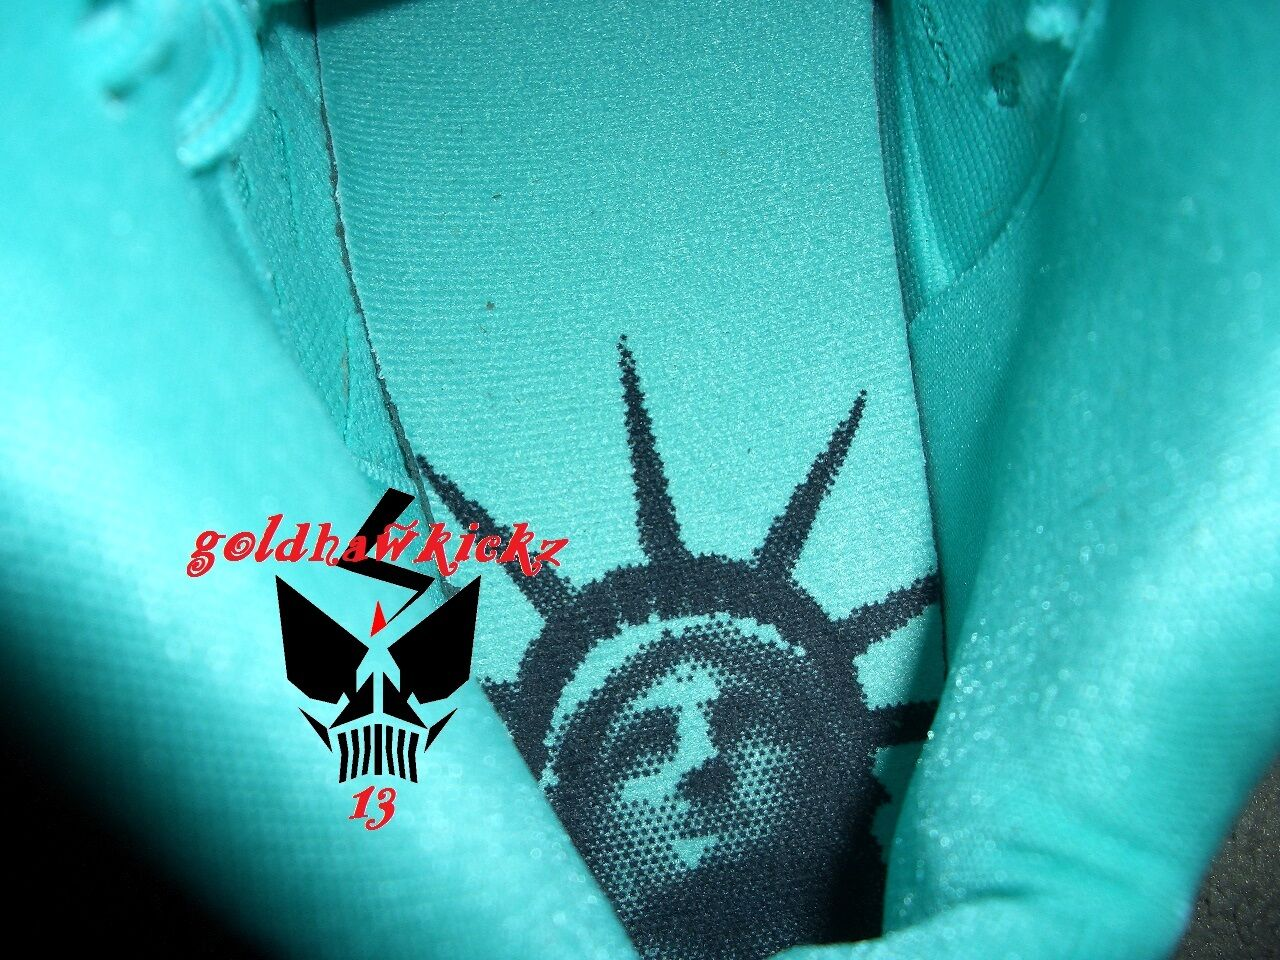 Nike Hyperposite Statue Of Liberty SOL SOL SOL 10 galaxy barkley foamposite rondo 6effd3